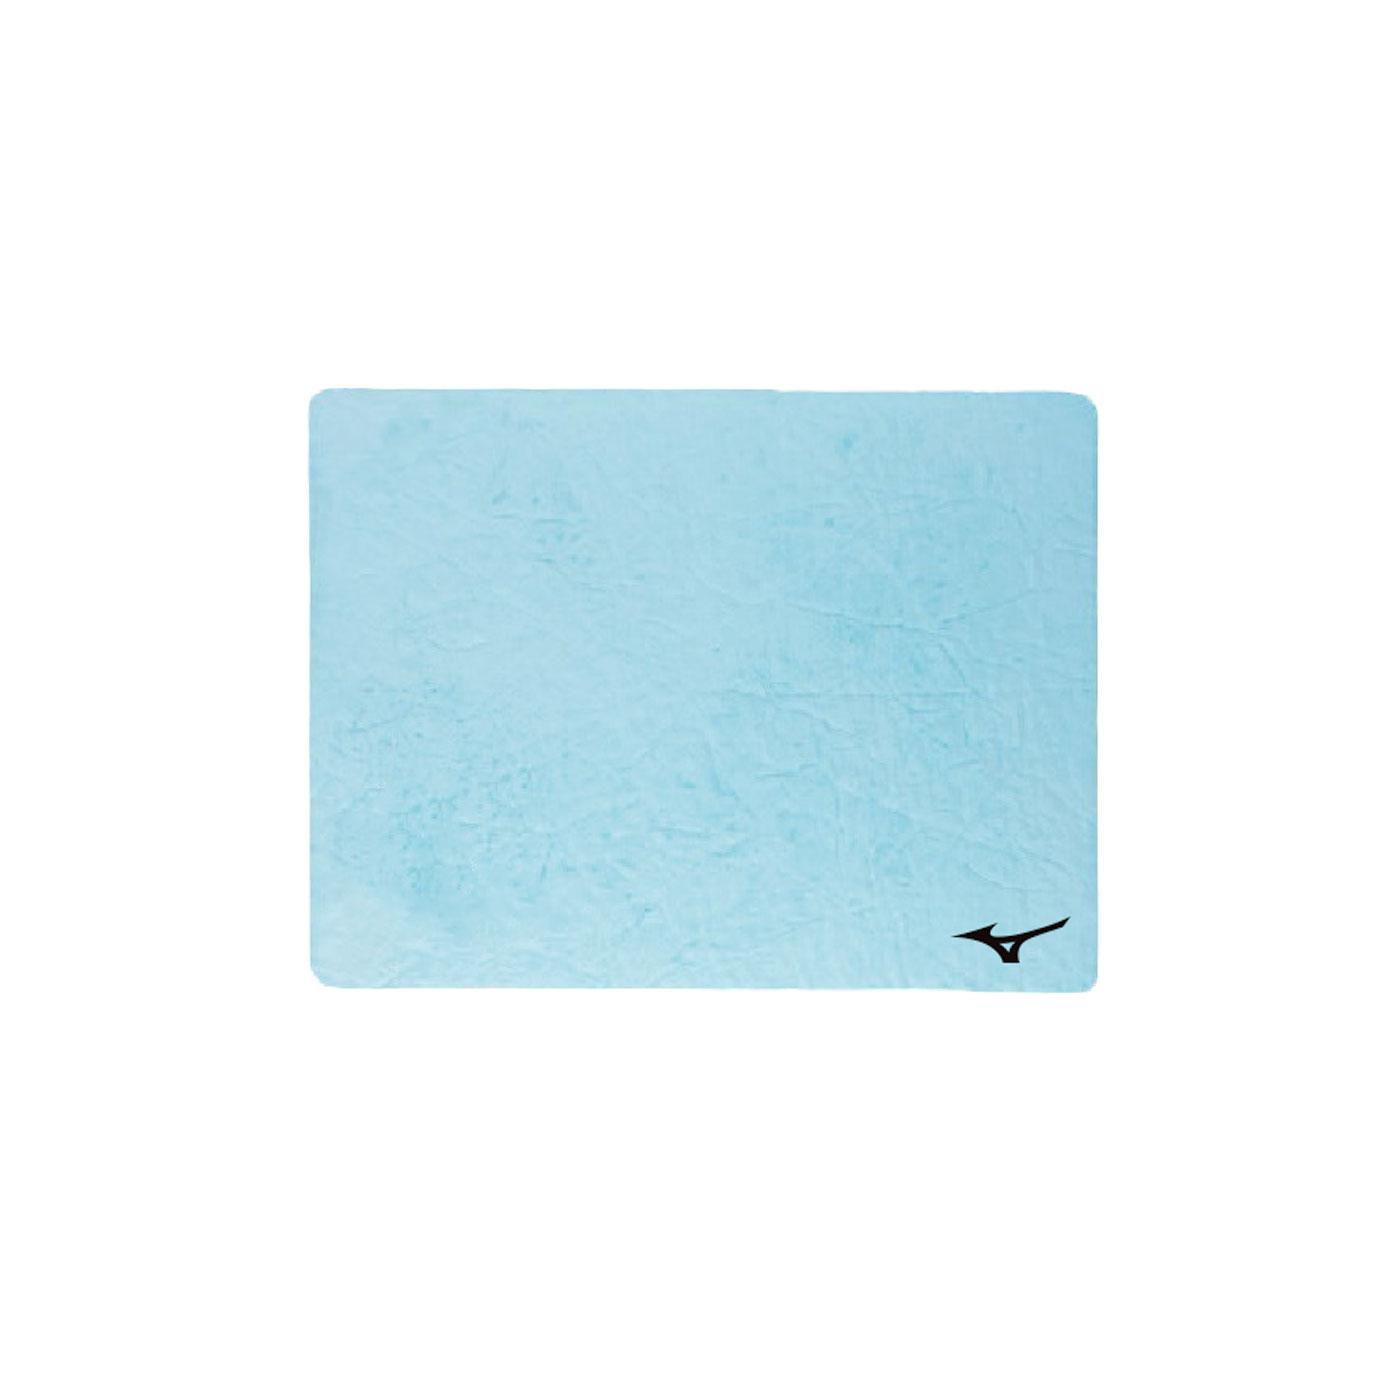 MIZUNO 日製吸水巾  SWIMN2JY801000-19 - 粉藍